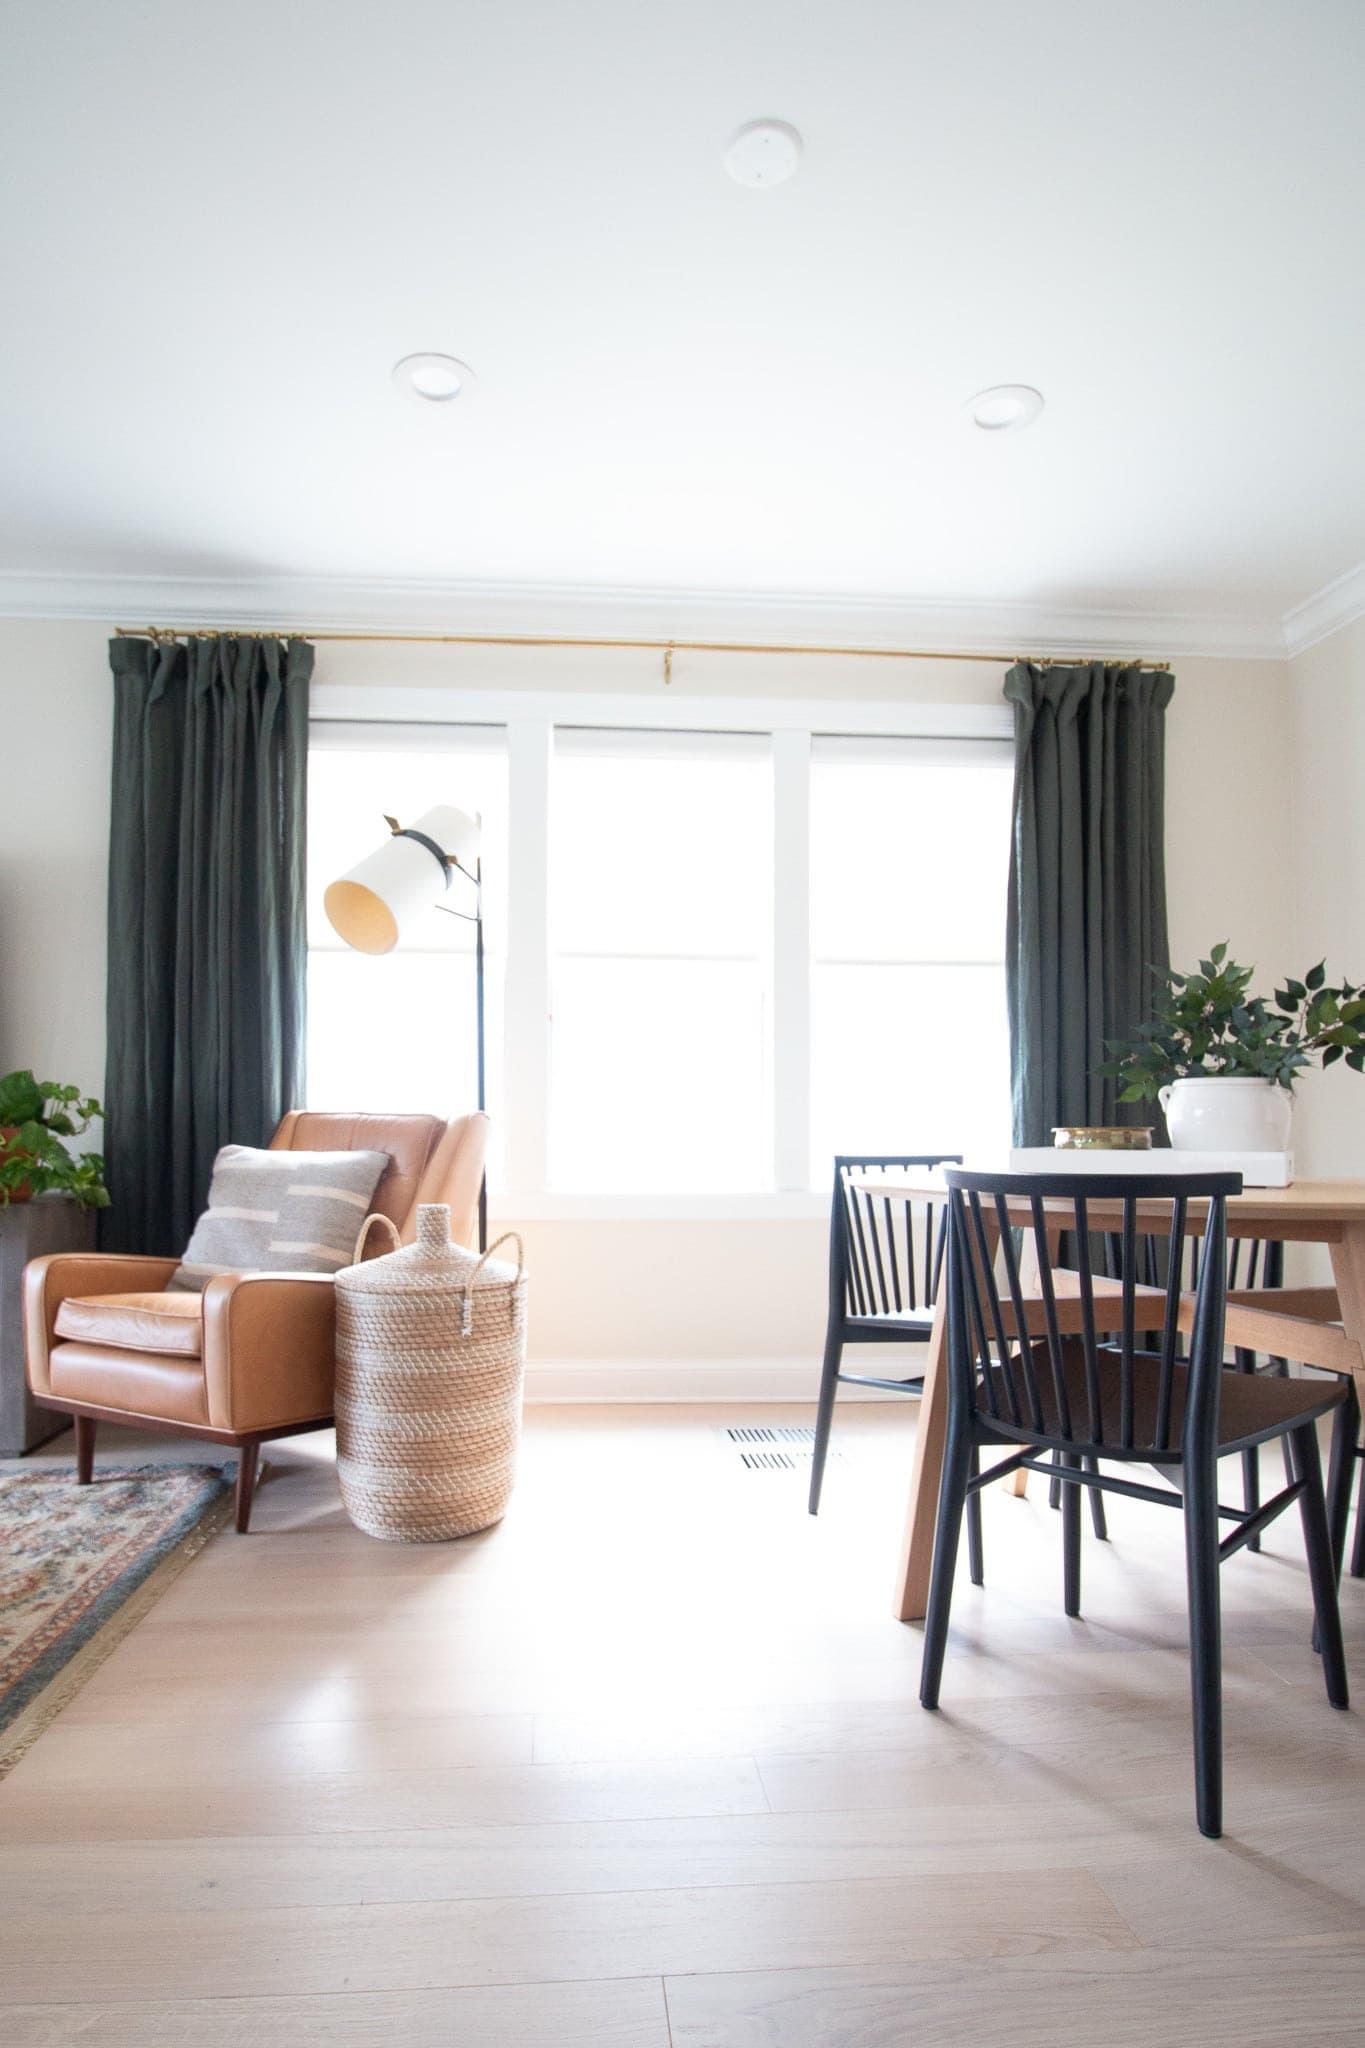 Living room window shades